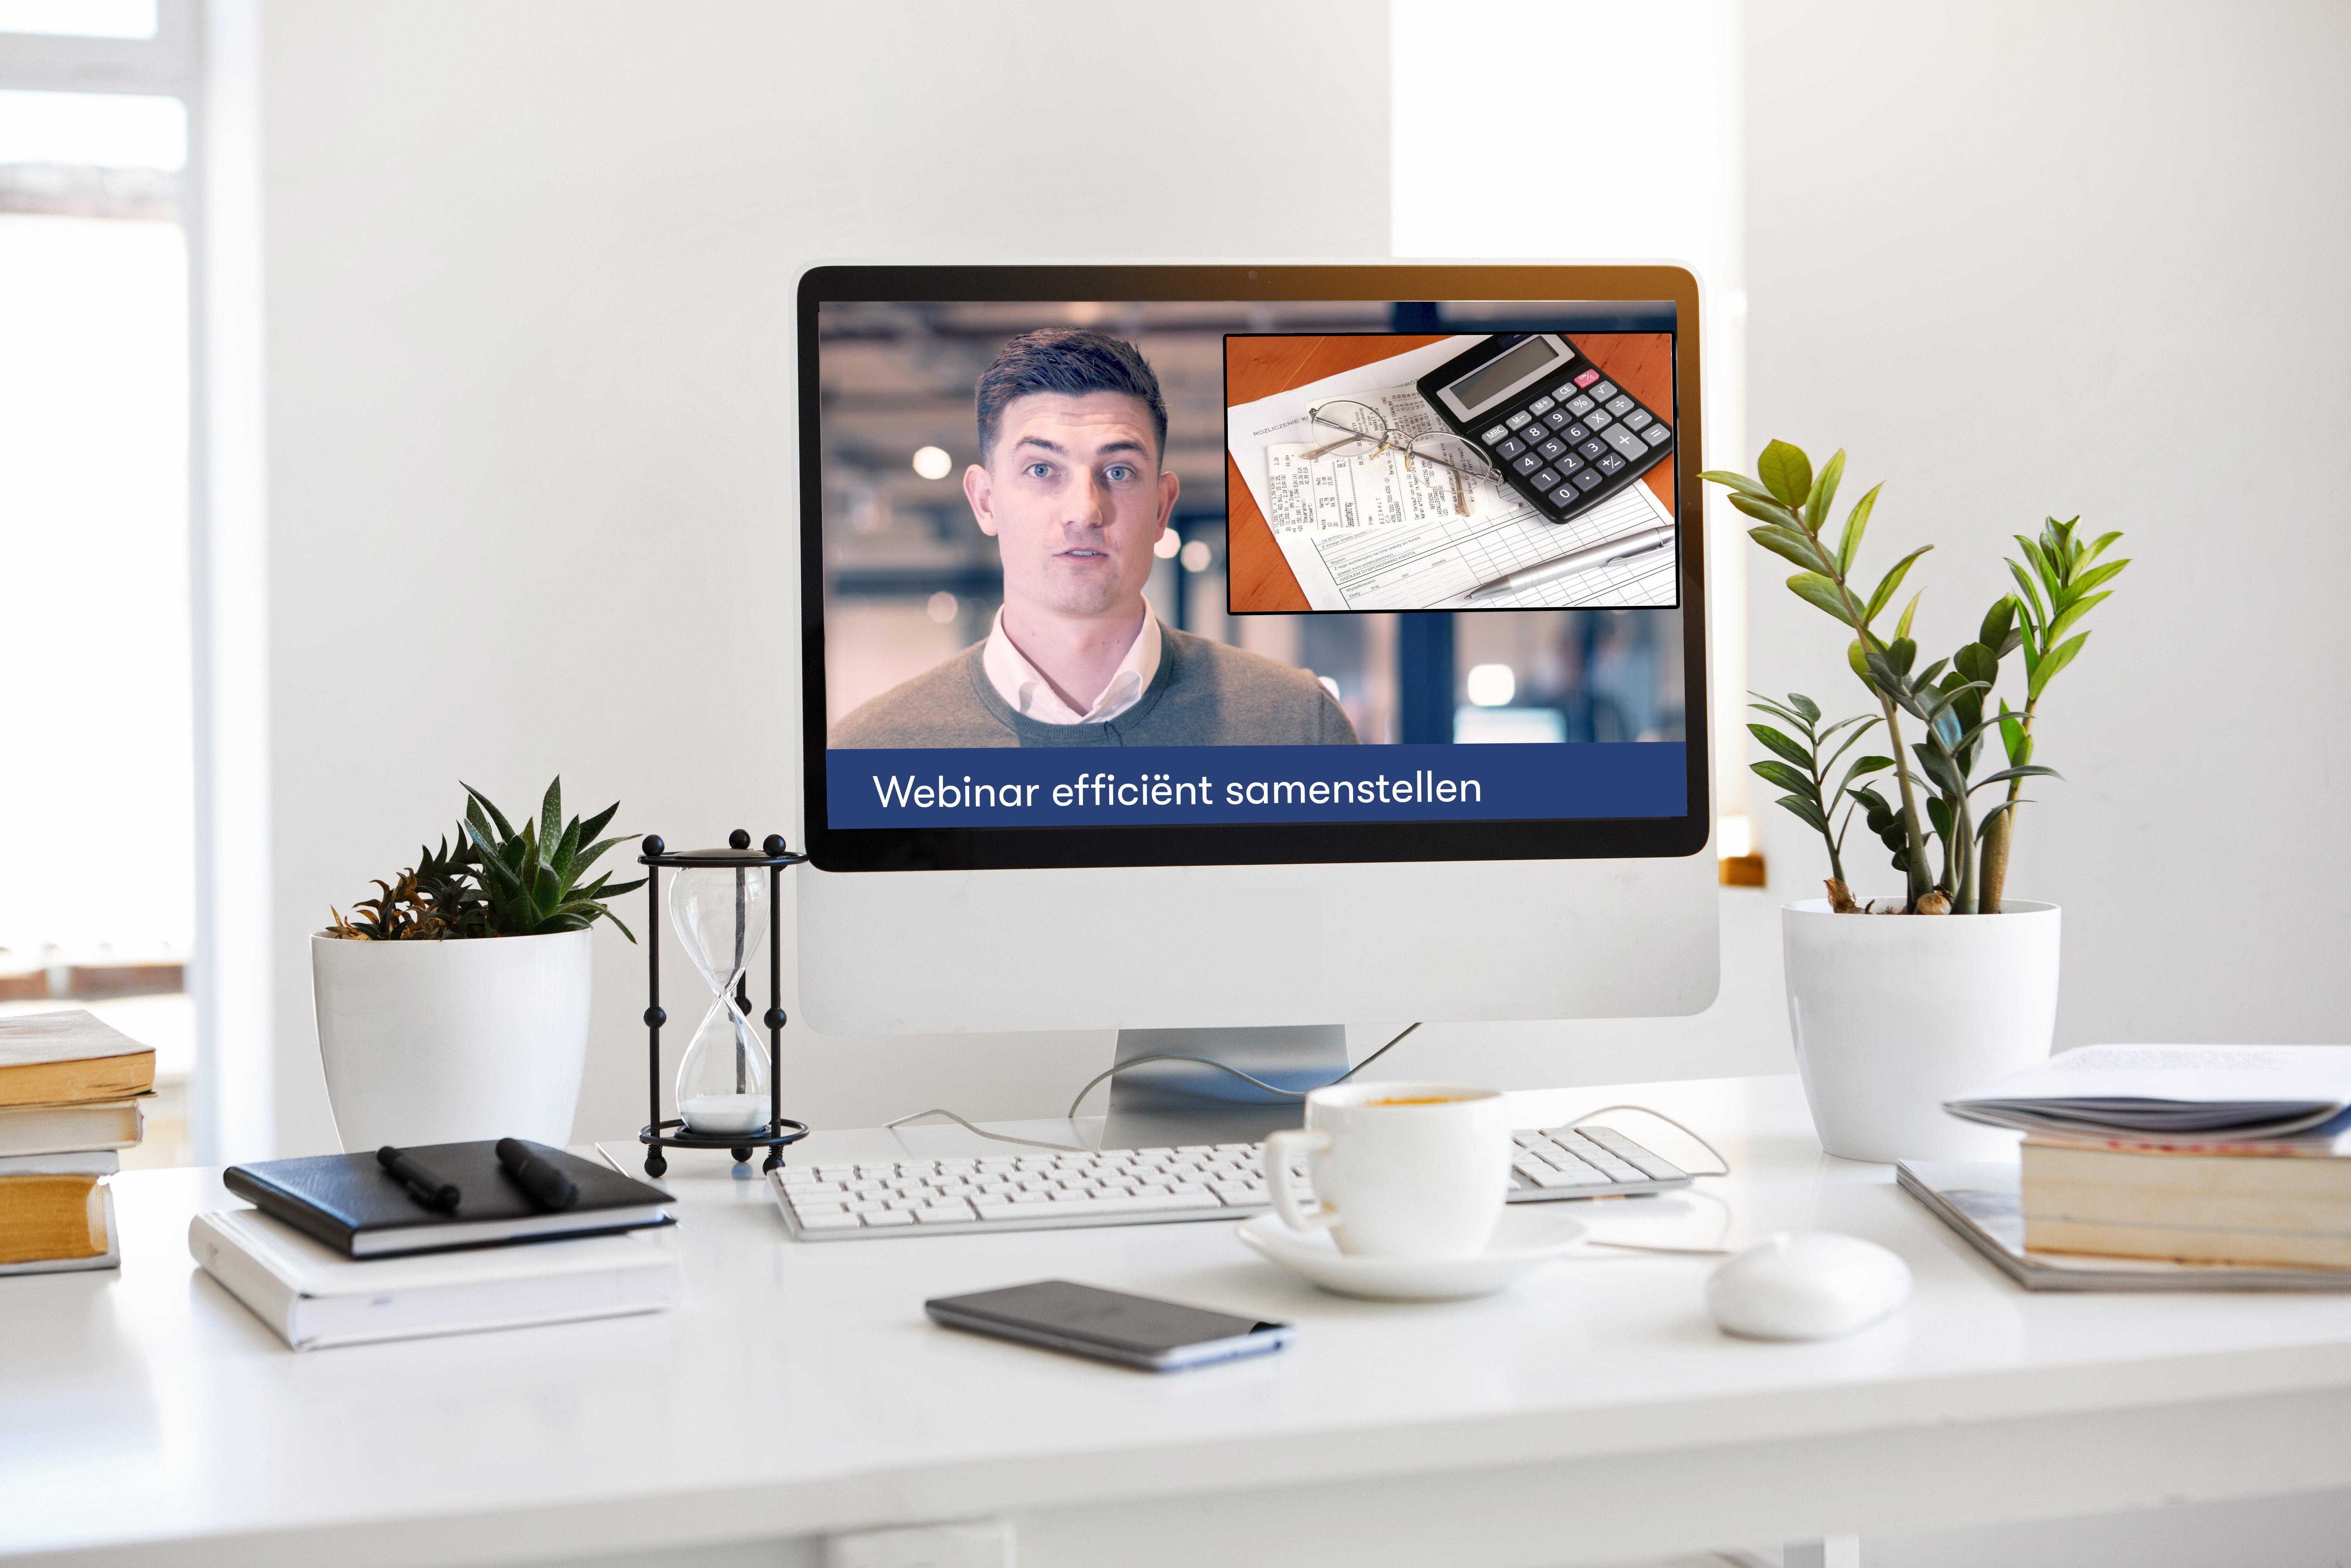 webinar efficient samenstellen